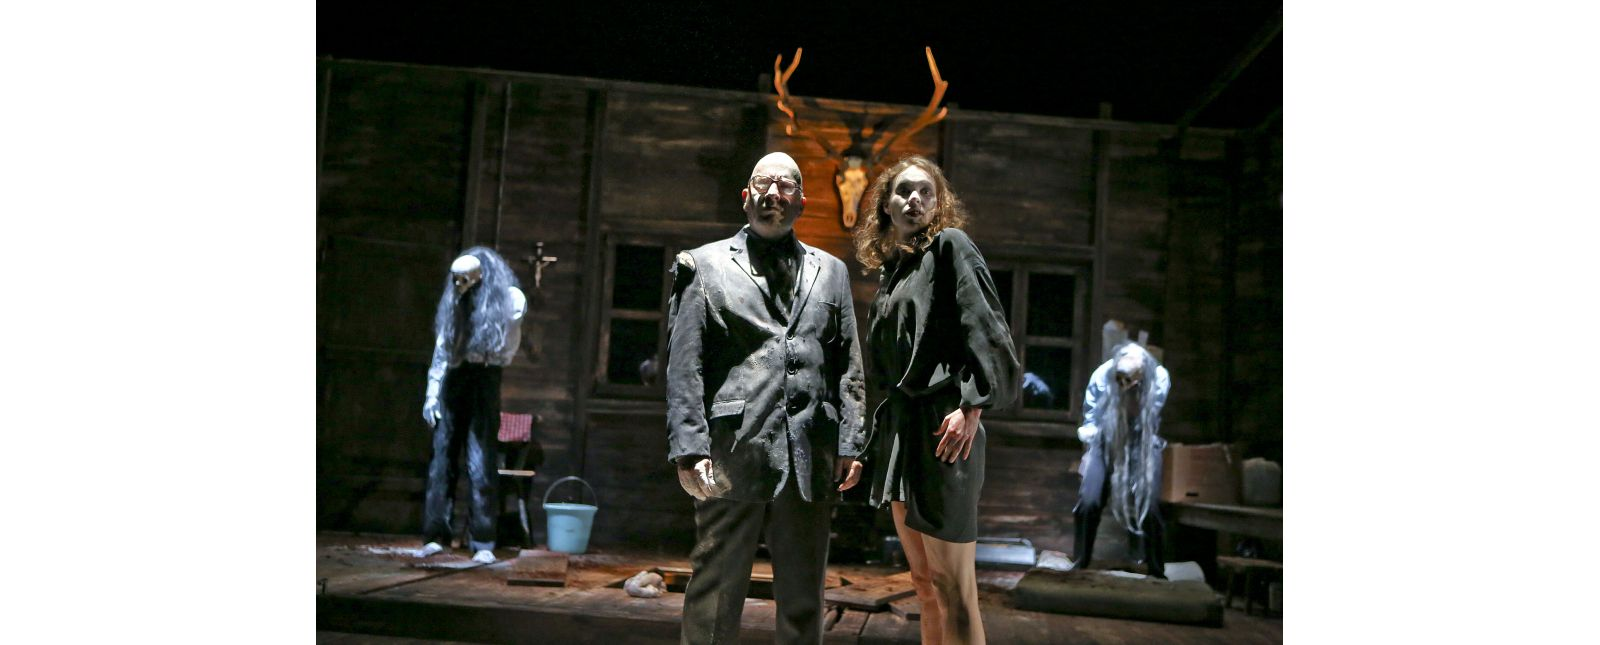 The Black Forest Chainsaw Opera // Lukas Hupfeld, Holger Kunkel, Inga Schäfer, Janna Horstmann // Birgit Hupfeld // 2018